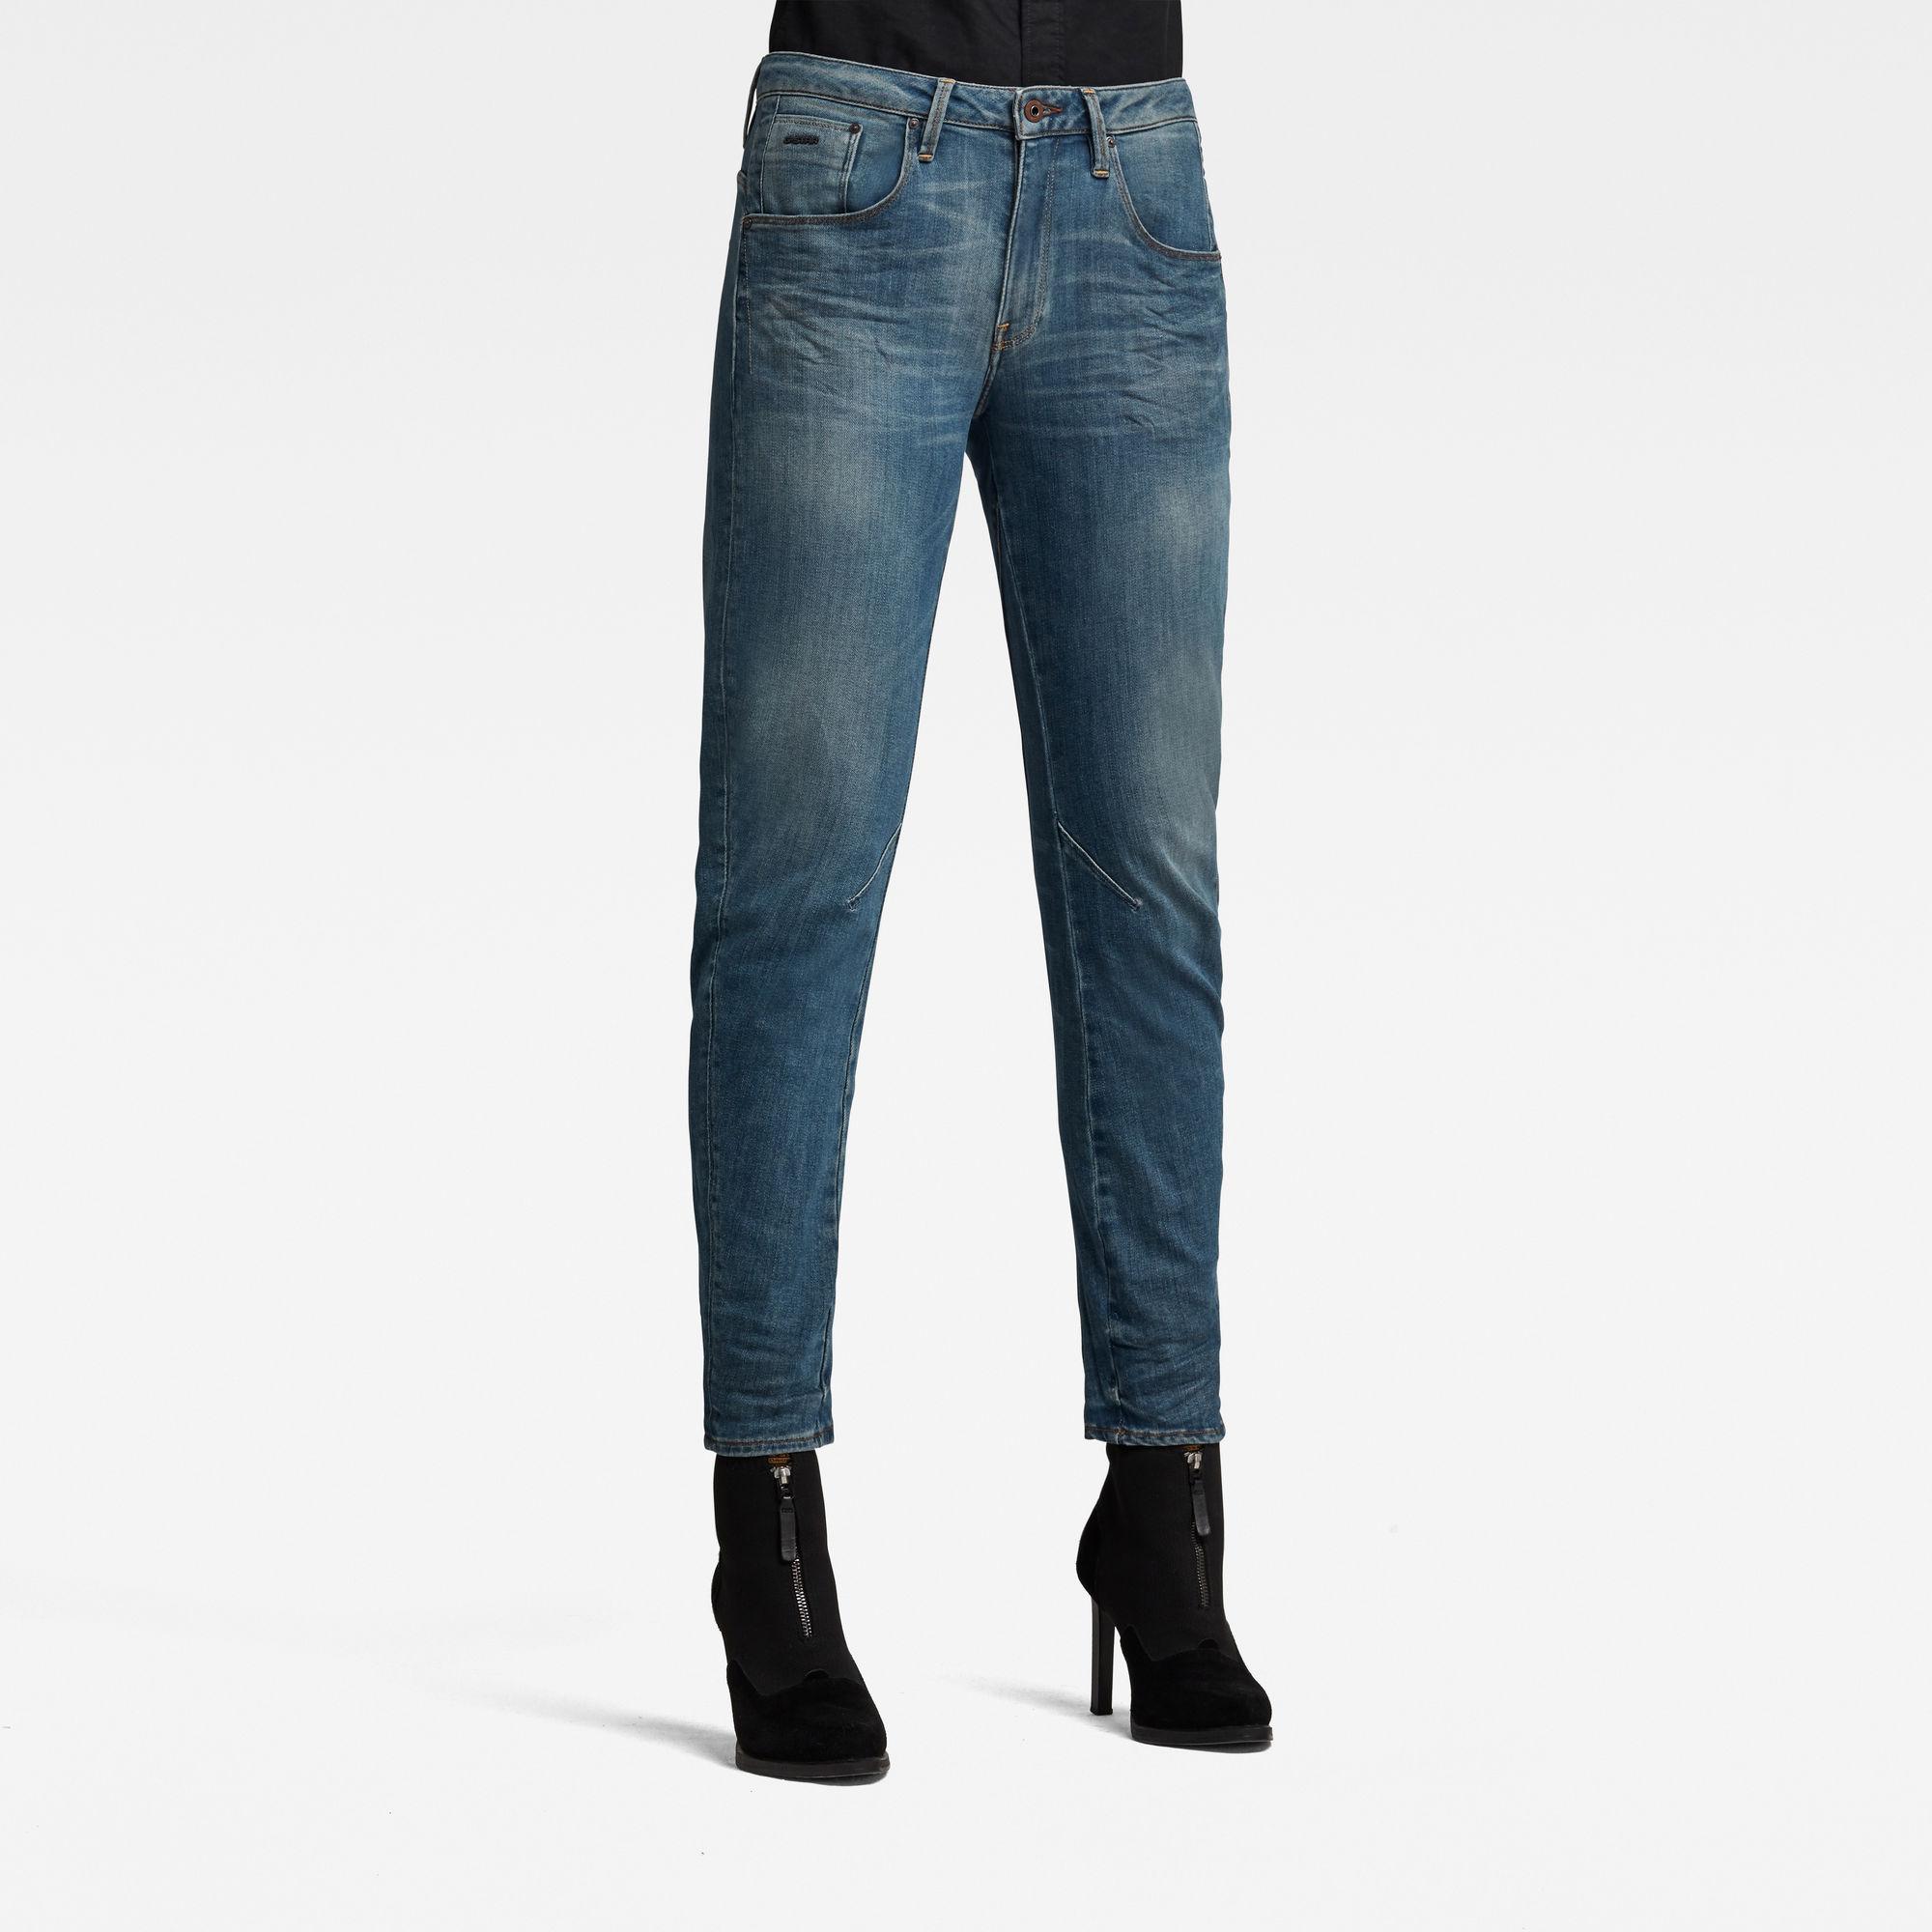 G-Star RAW Dames Arc 3D Low Boyfriend Jeans Blauw